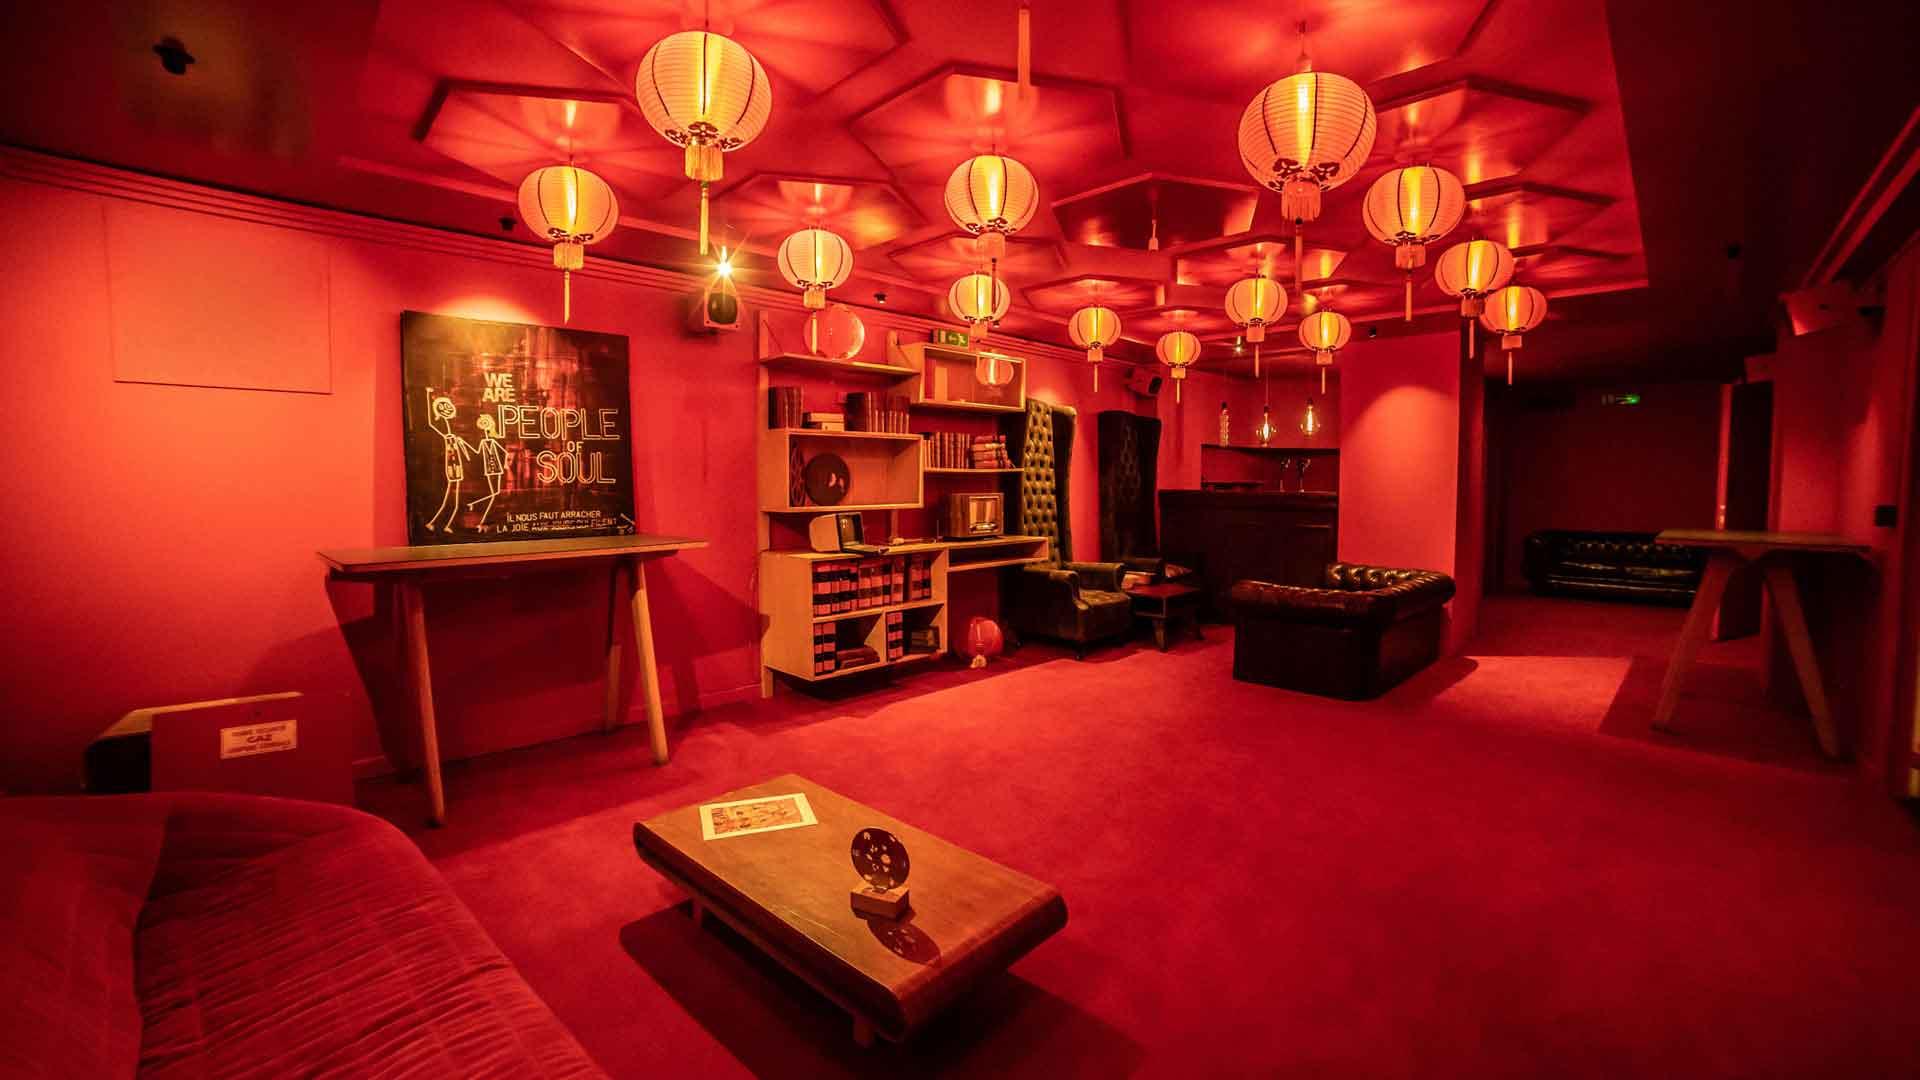 Atelier-des-artistes-Red-room-plan-large